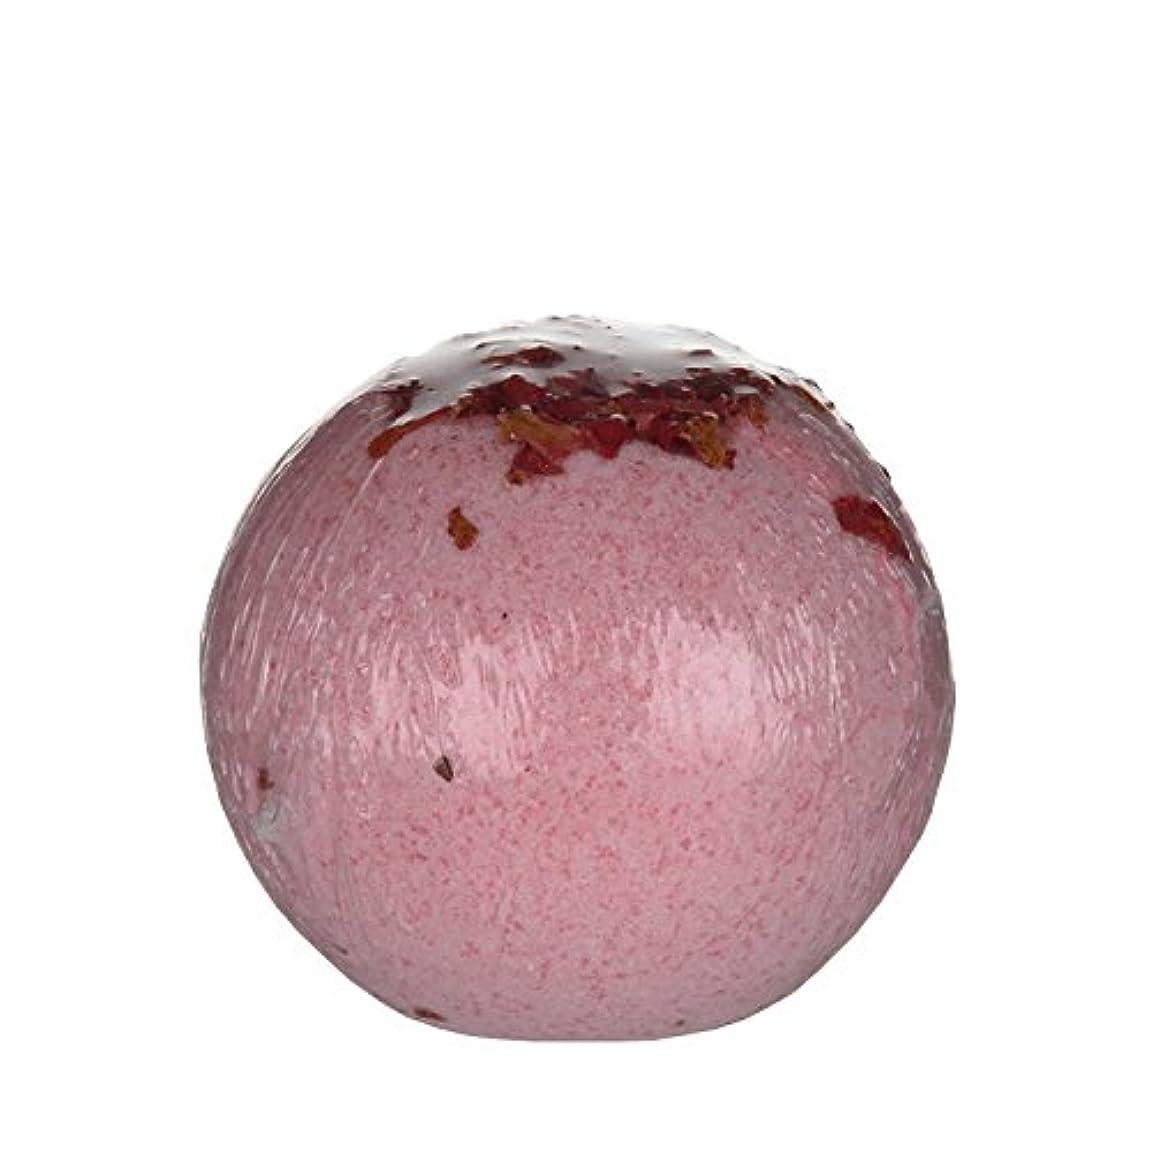 Treets Bath Ball Lavender Love 170g (Pack of 2) - Treetsバスボールラベンダーの愛の170グラム (x2) [並行輸入品]